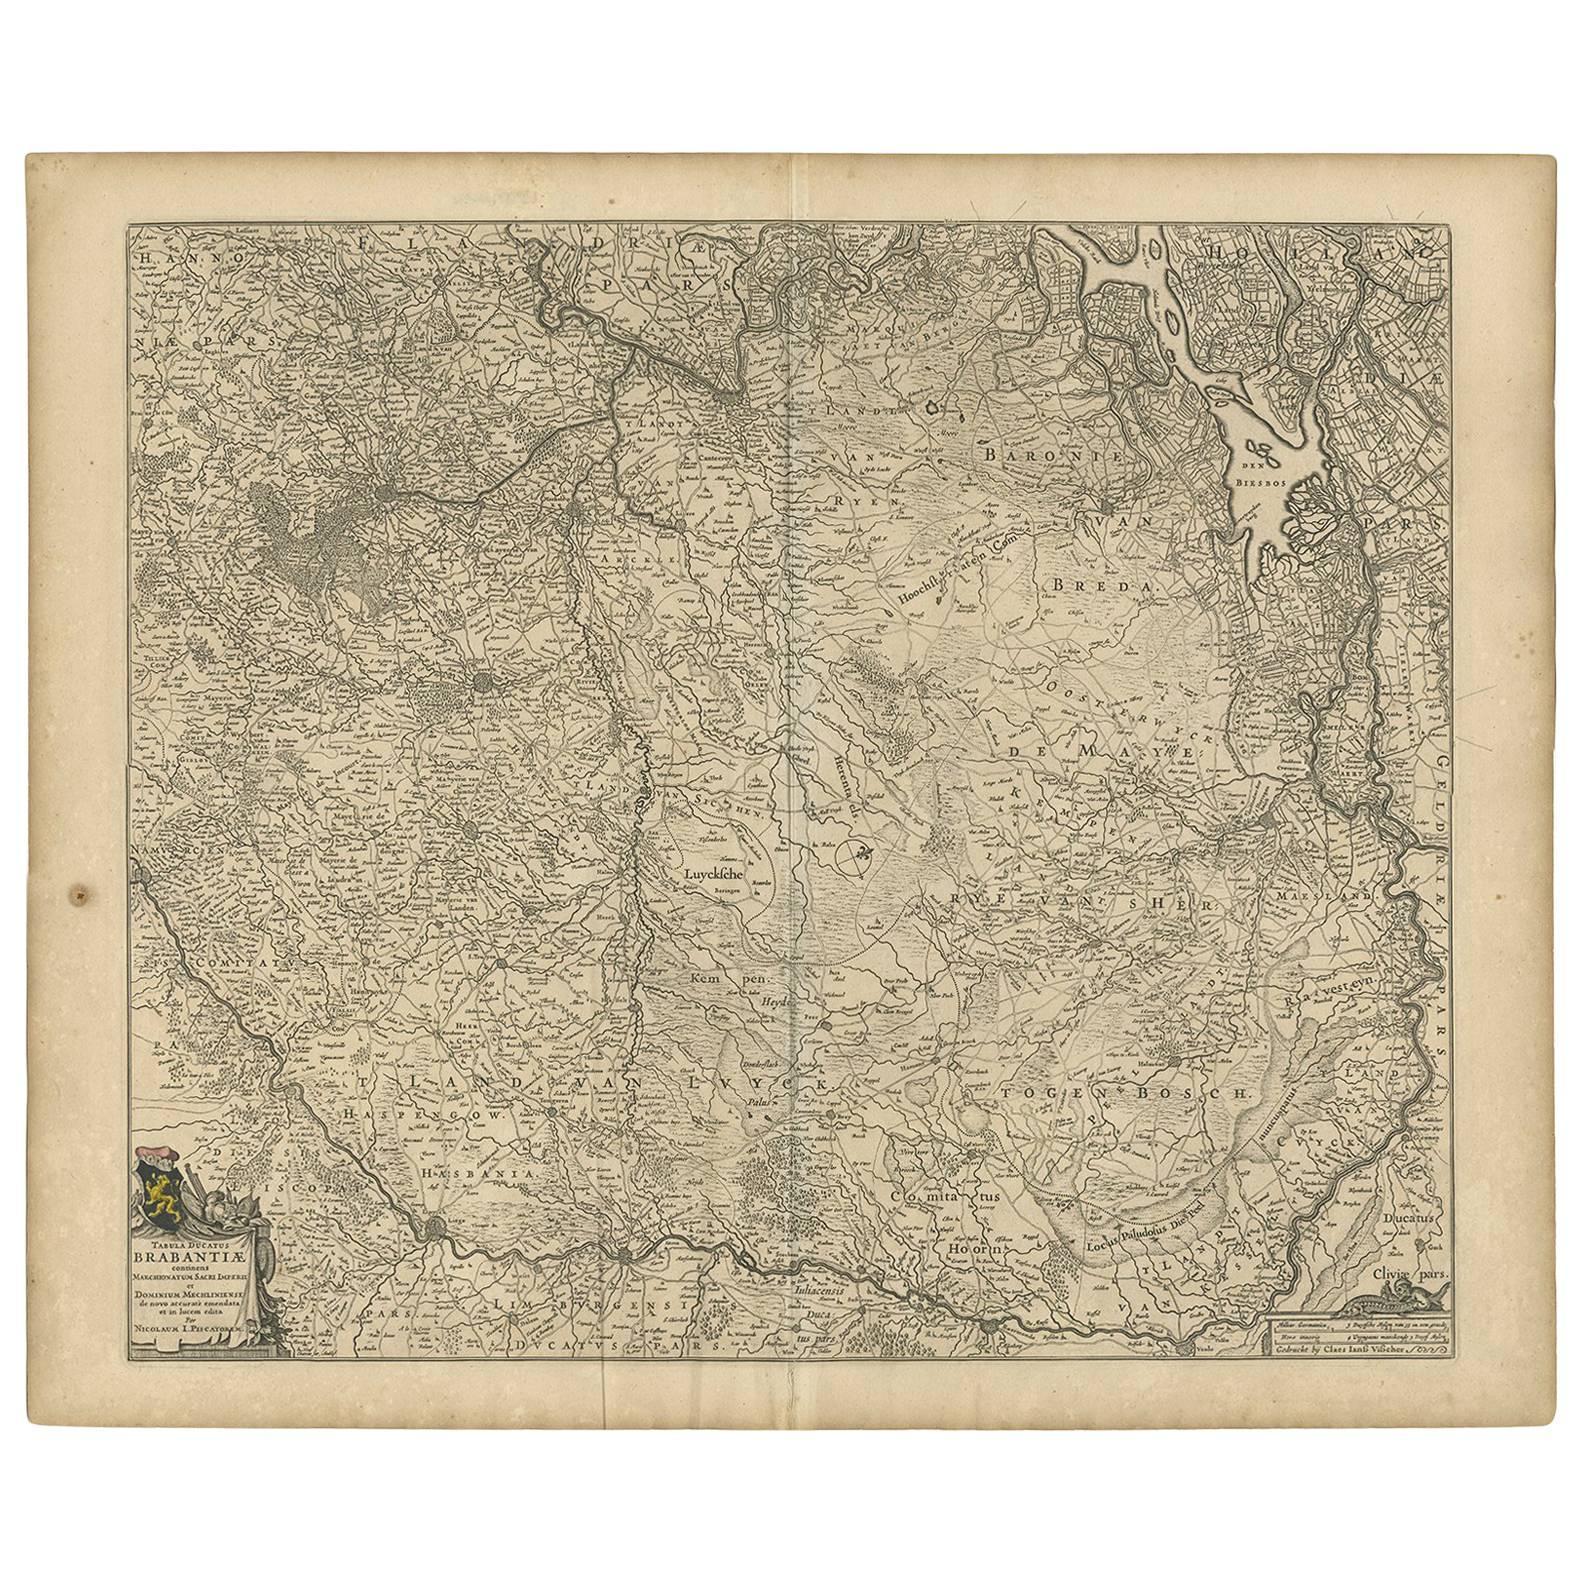 Antique Map of Brabant 'The Netherlands' by N. Visscher, circa 1670